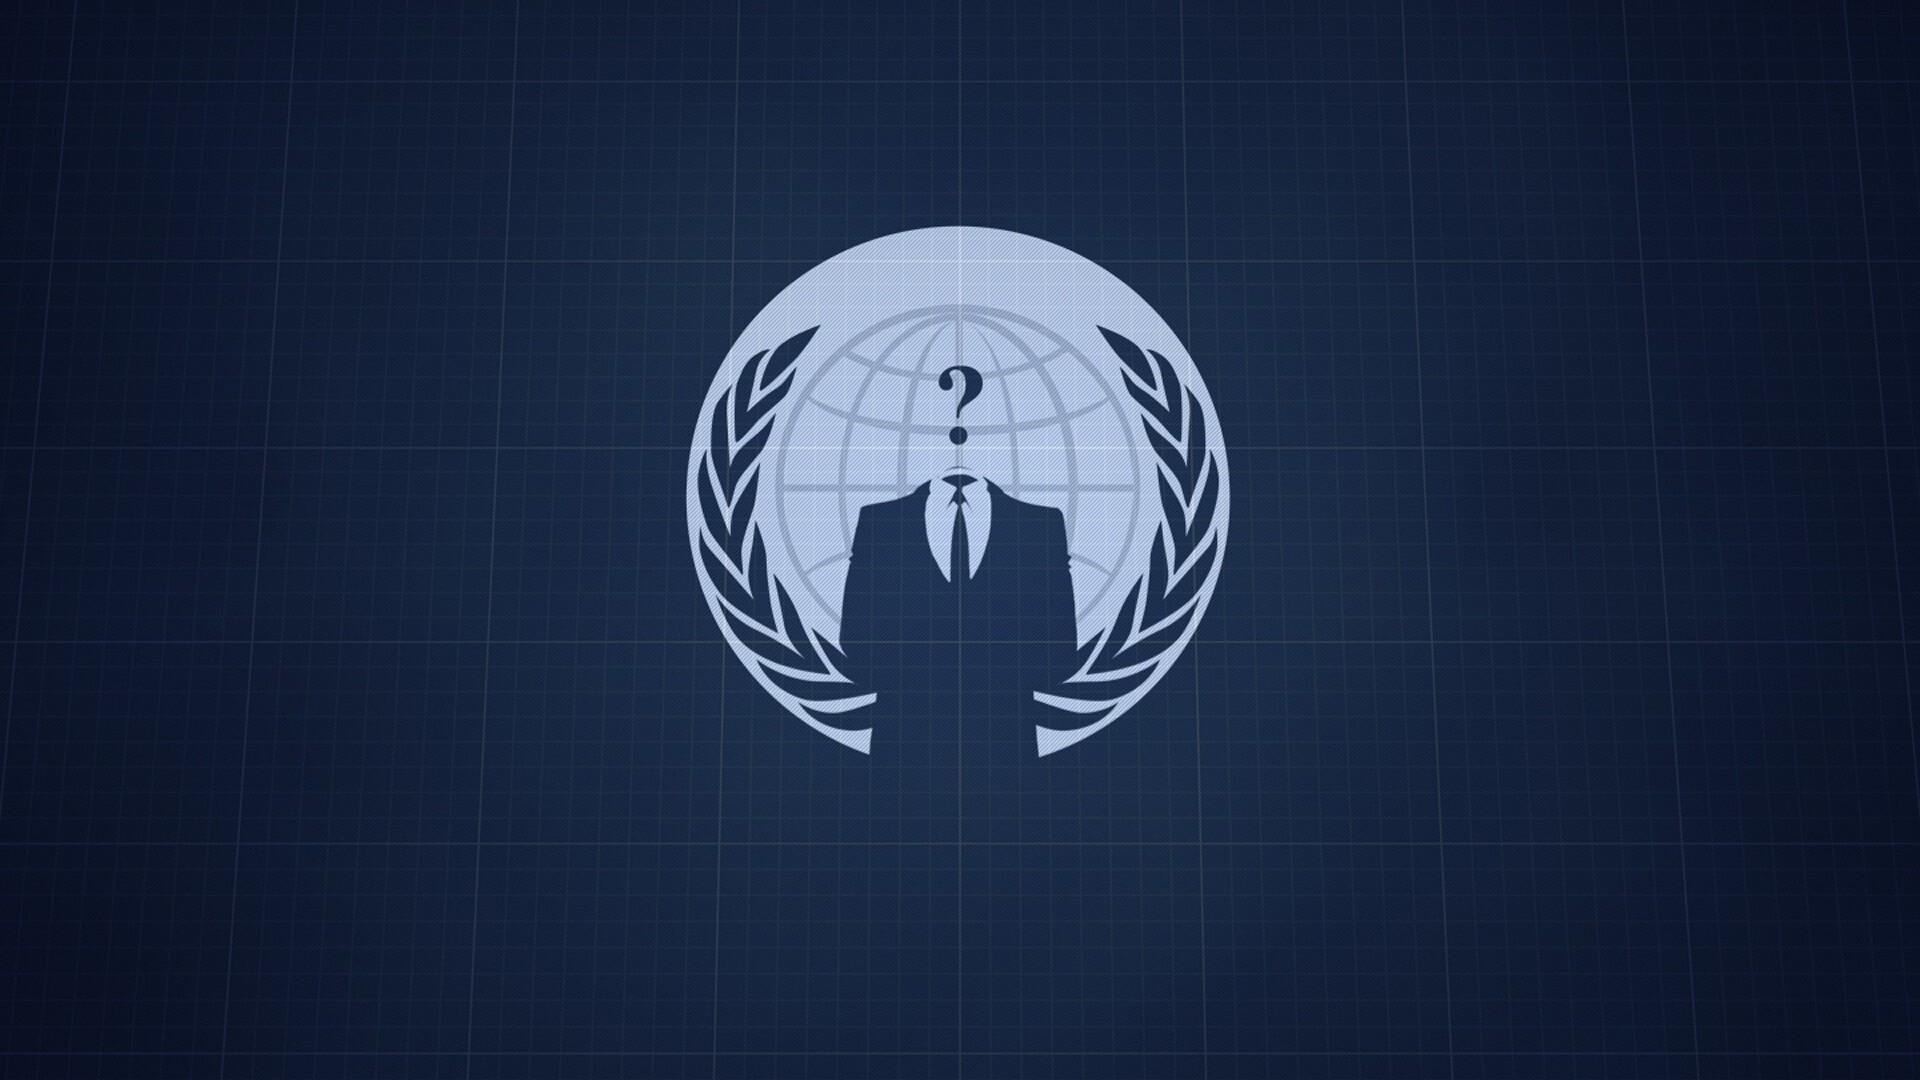 1920x1080 Anonymous V For Vendetta Laptop Full Hd 1080p Hd 4k